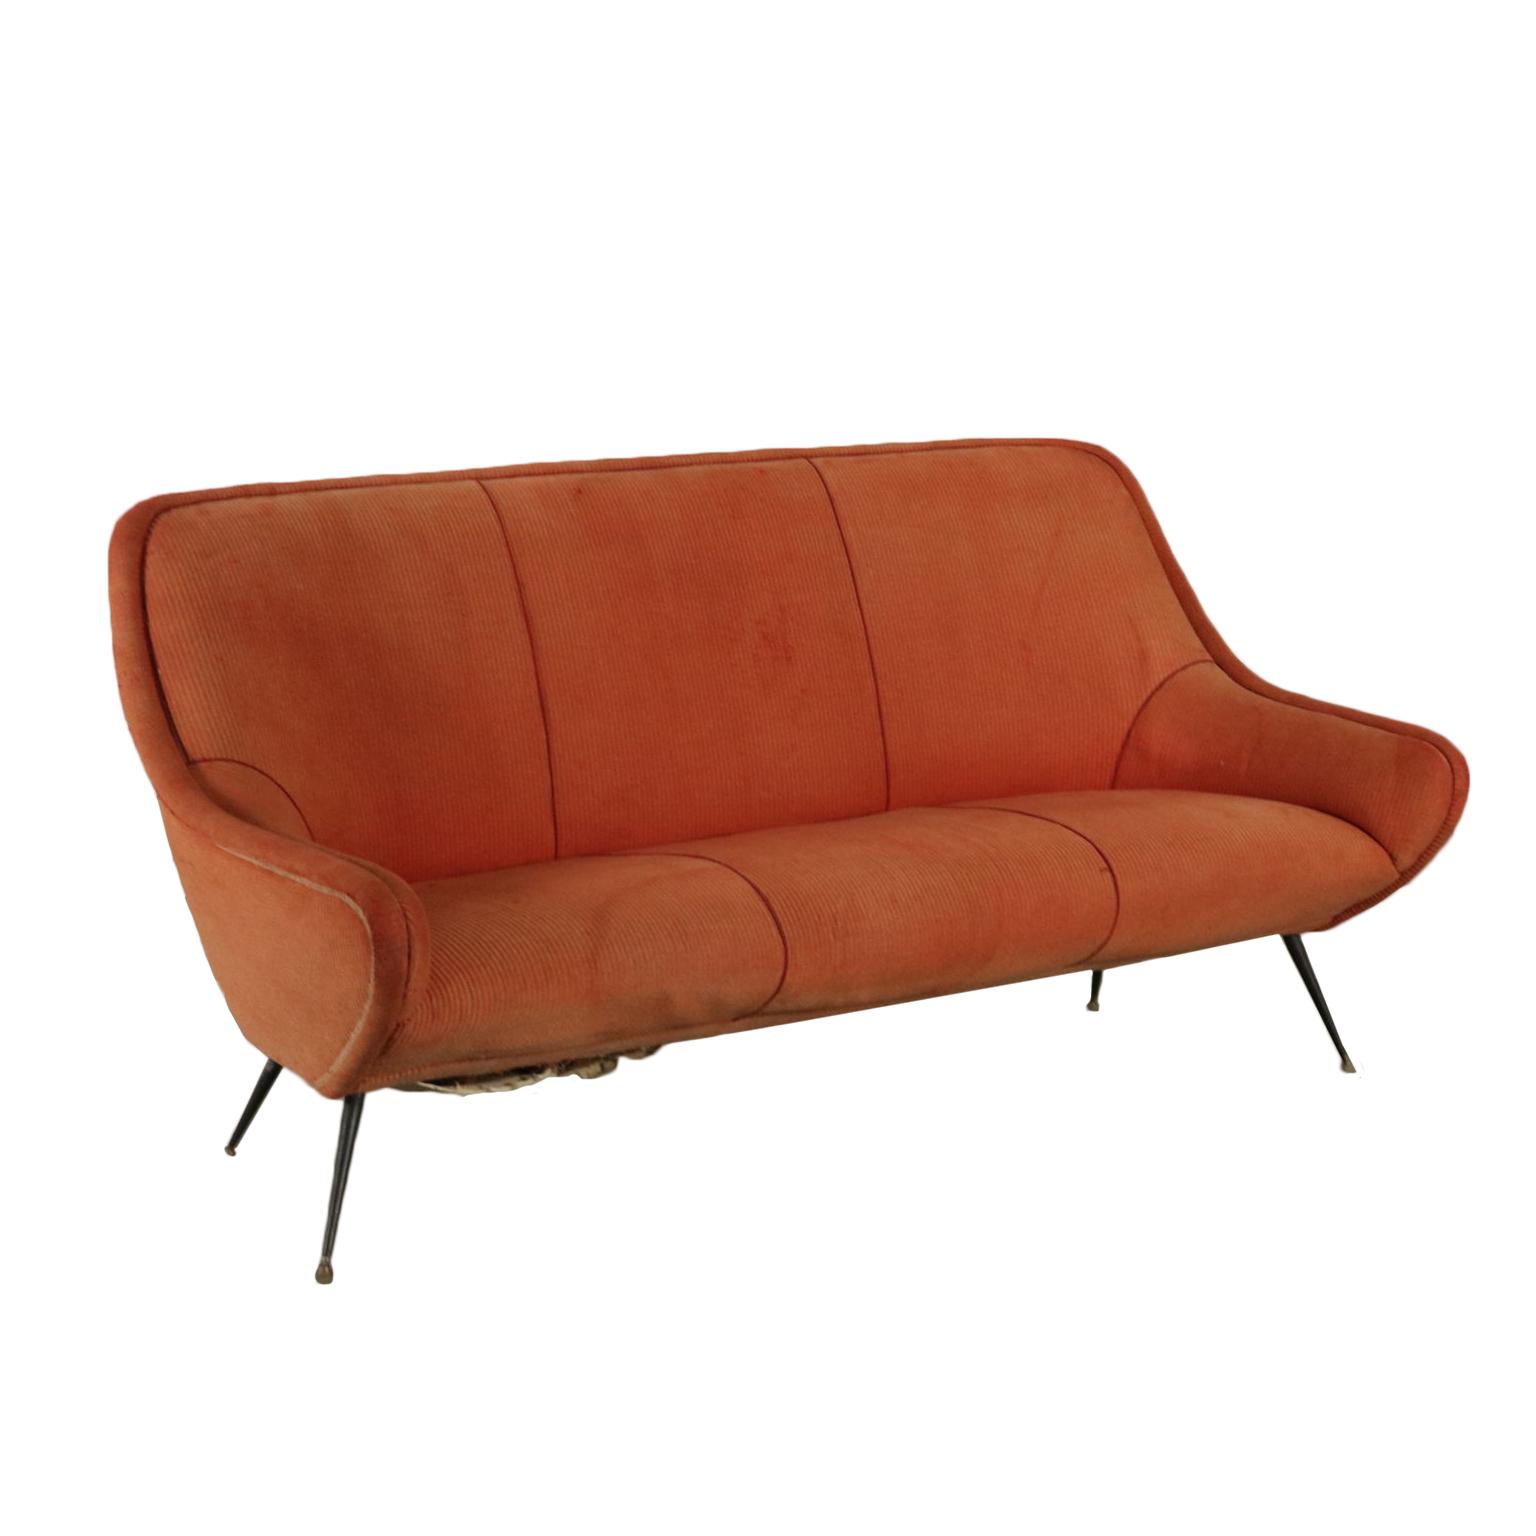 Sofa fabric upholstery foam padding vintage italy 1950s 1960s